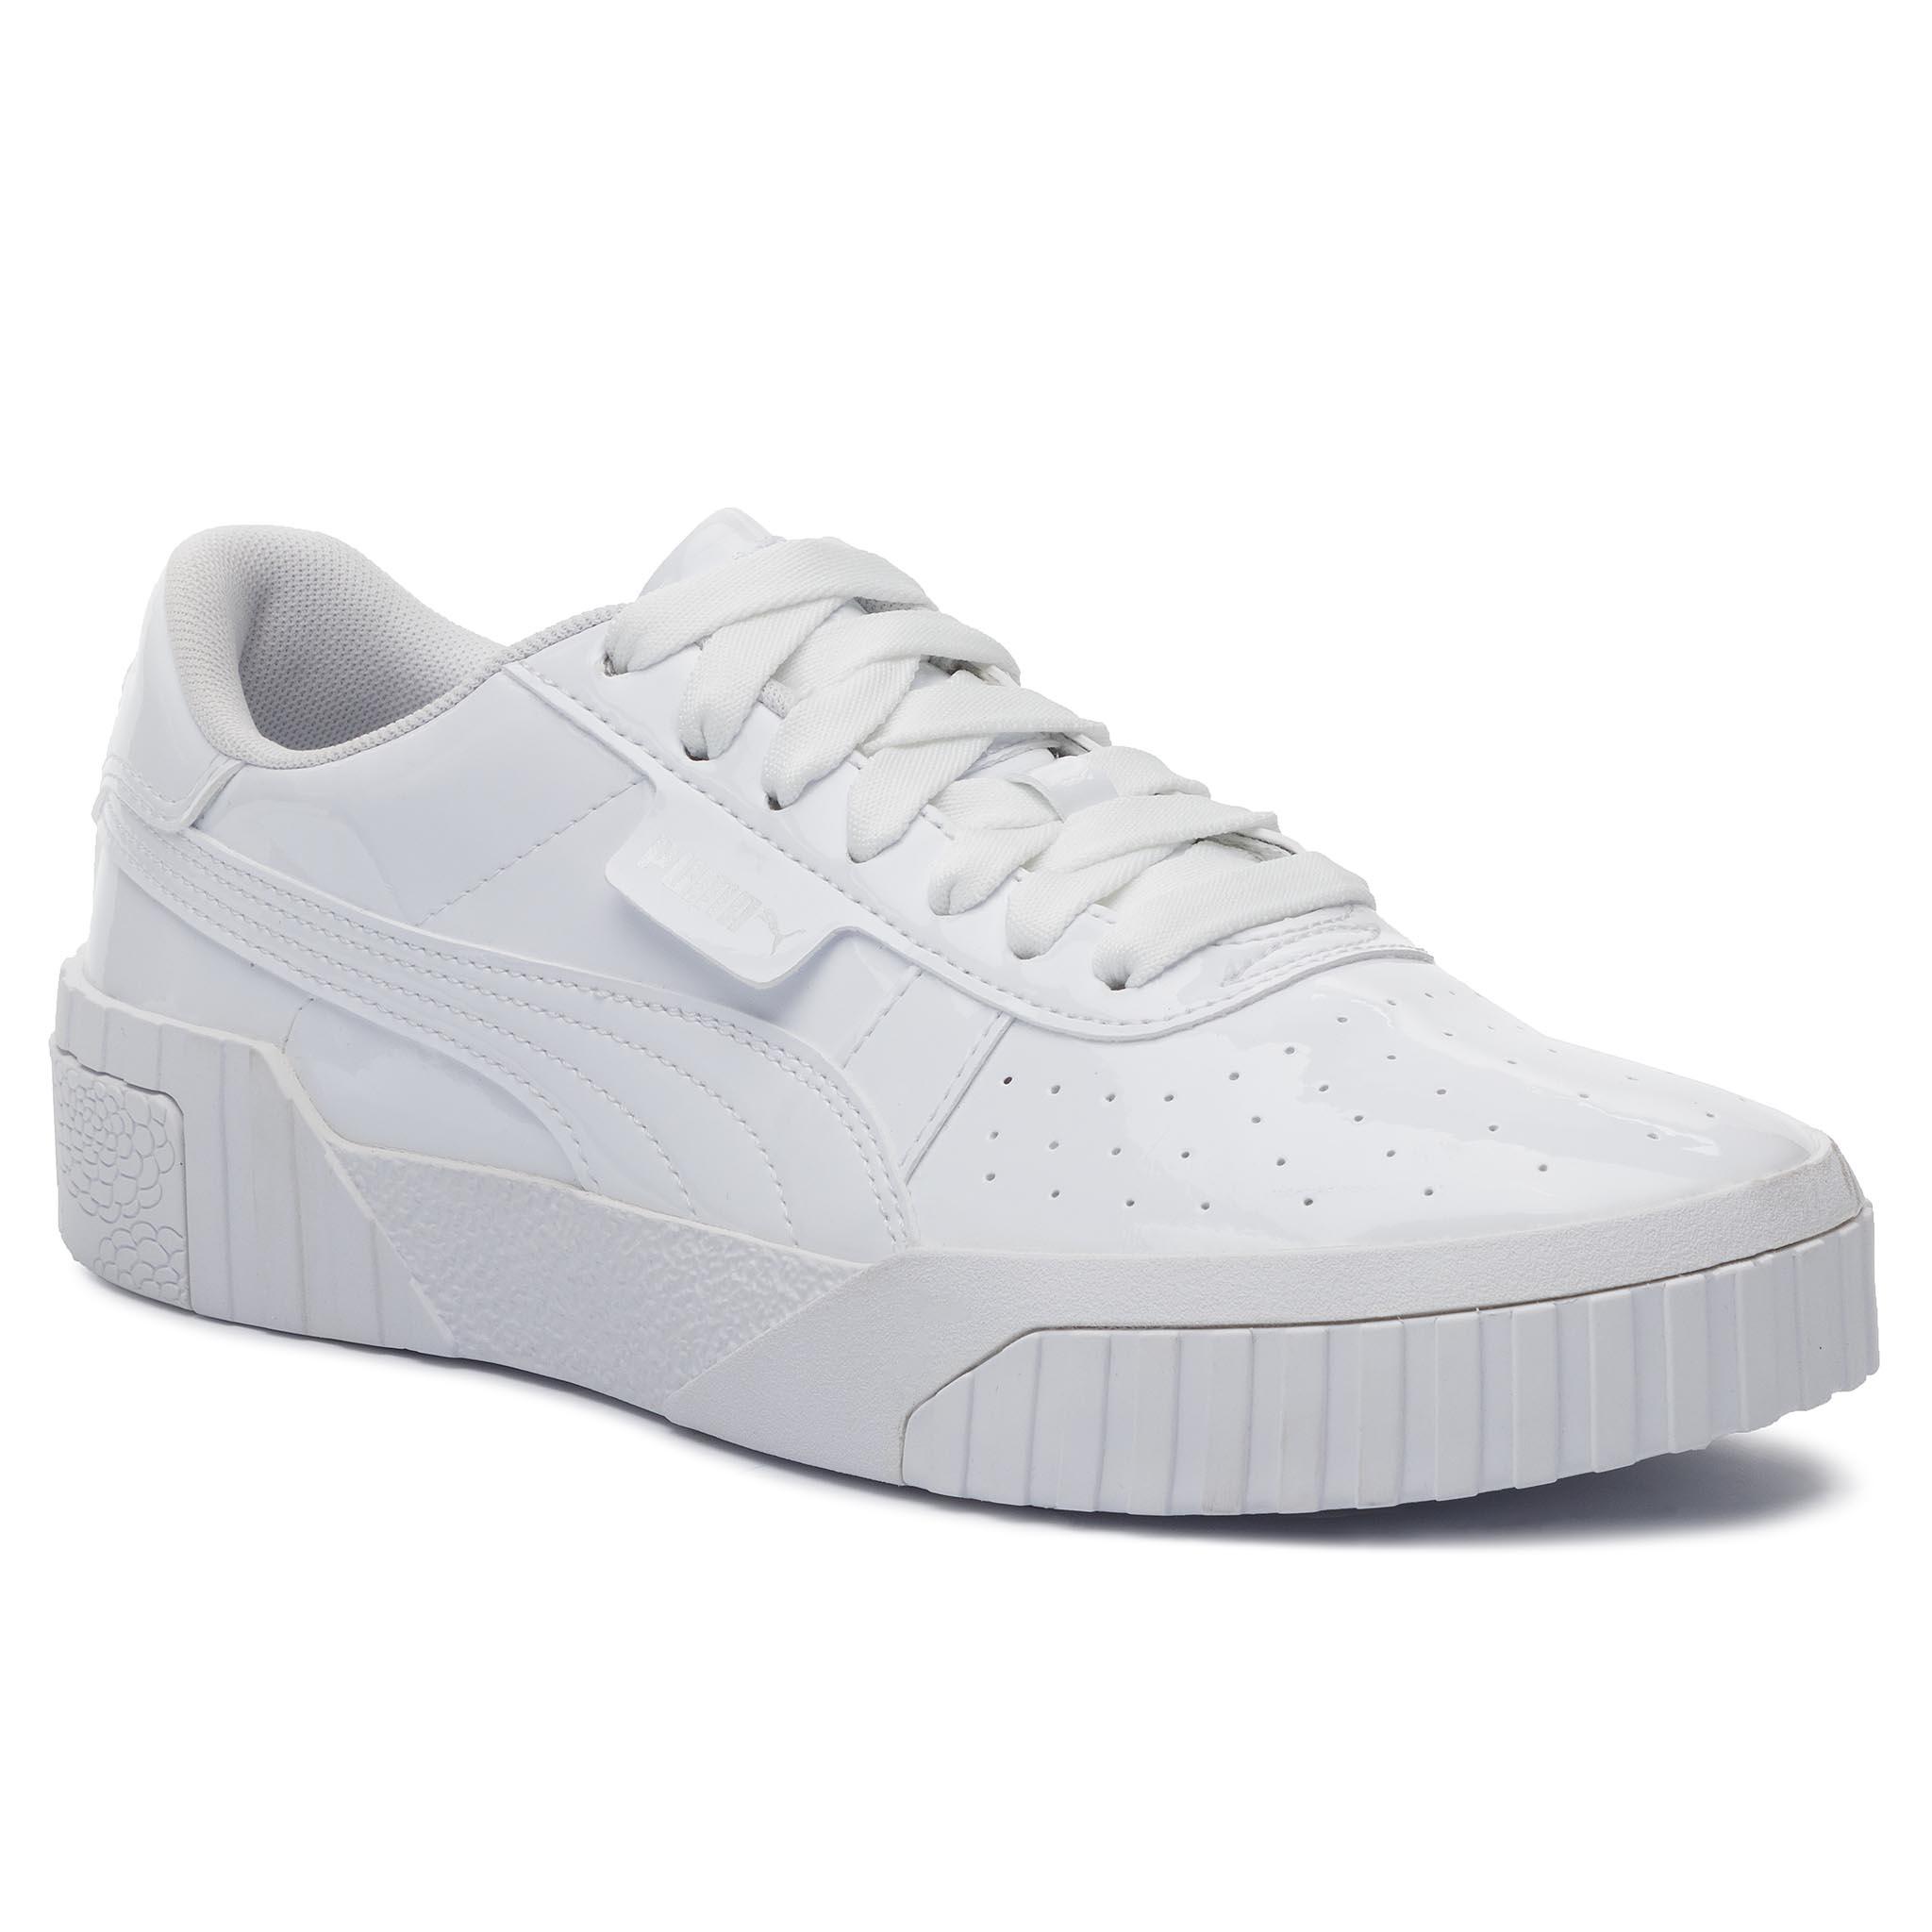 Sneakers PUMA Cali Patent Jr 370139 01 Puma WhitePuma White